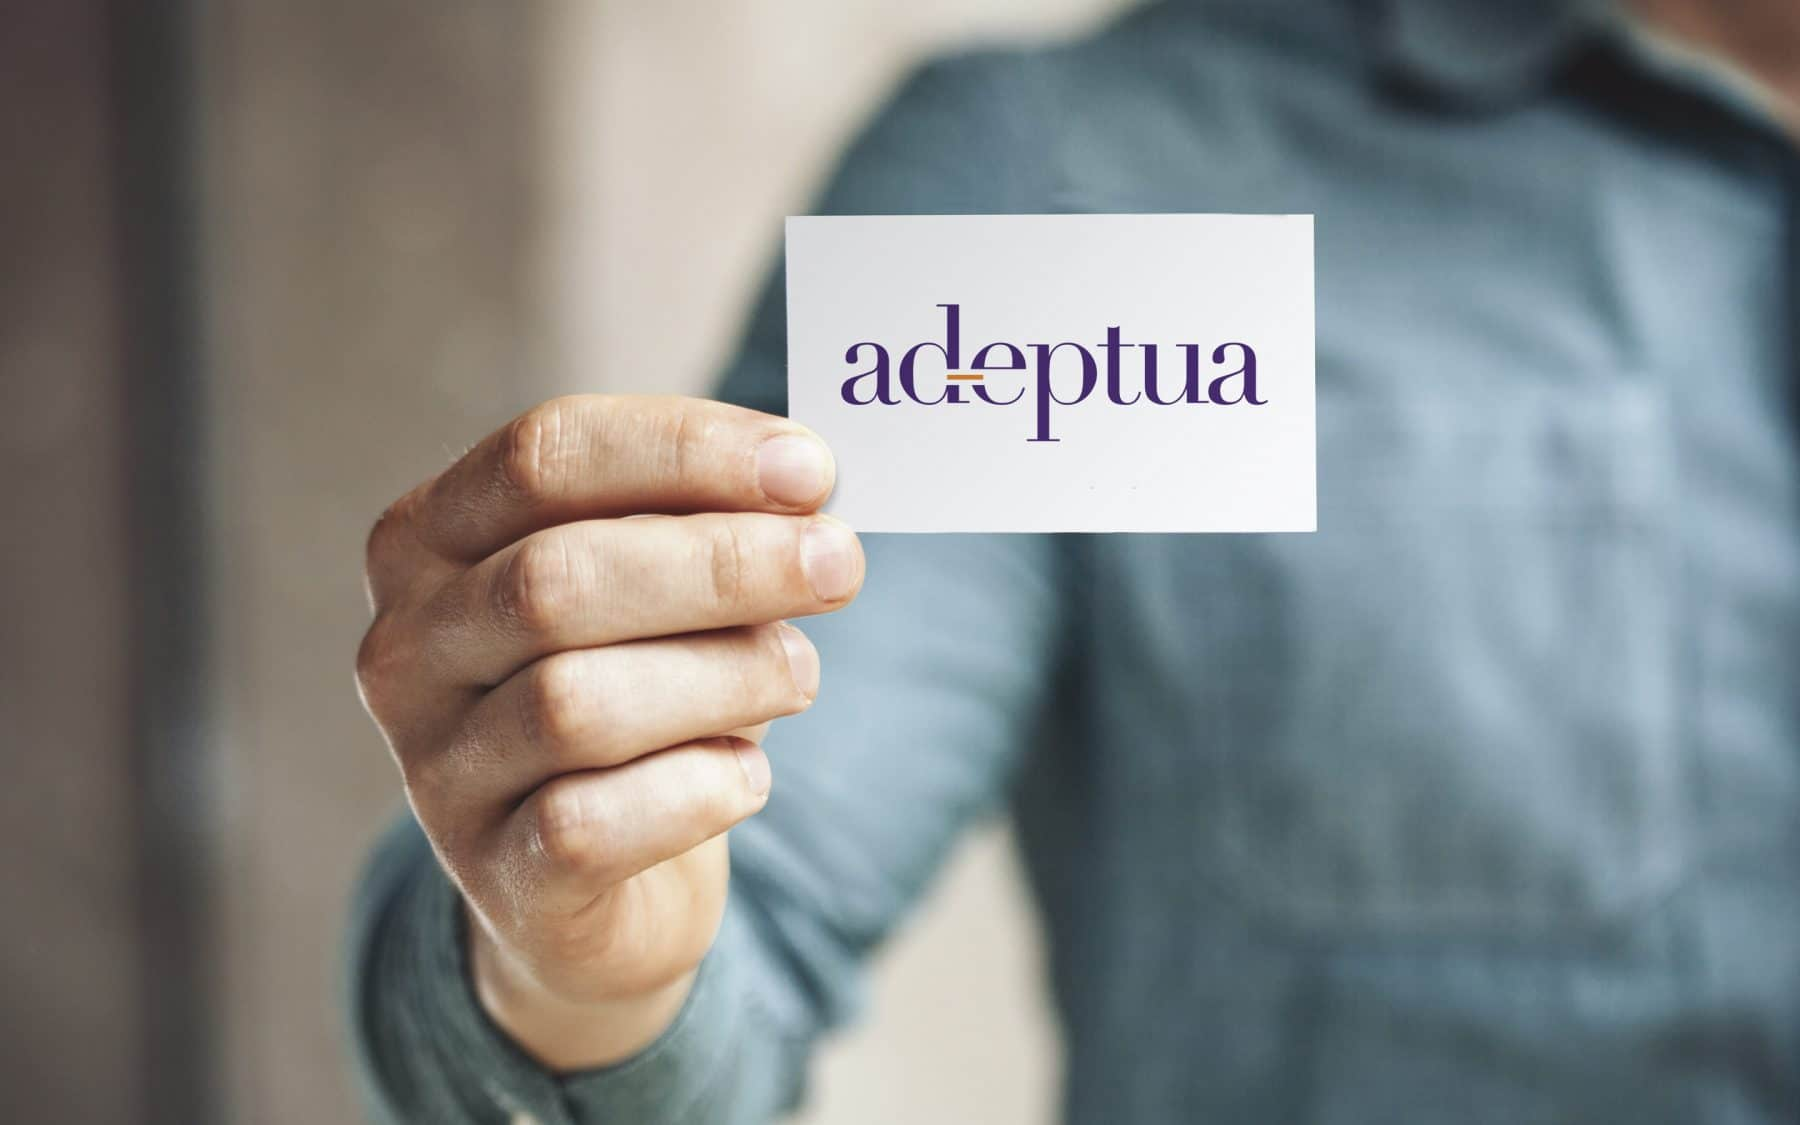 Adeptua